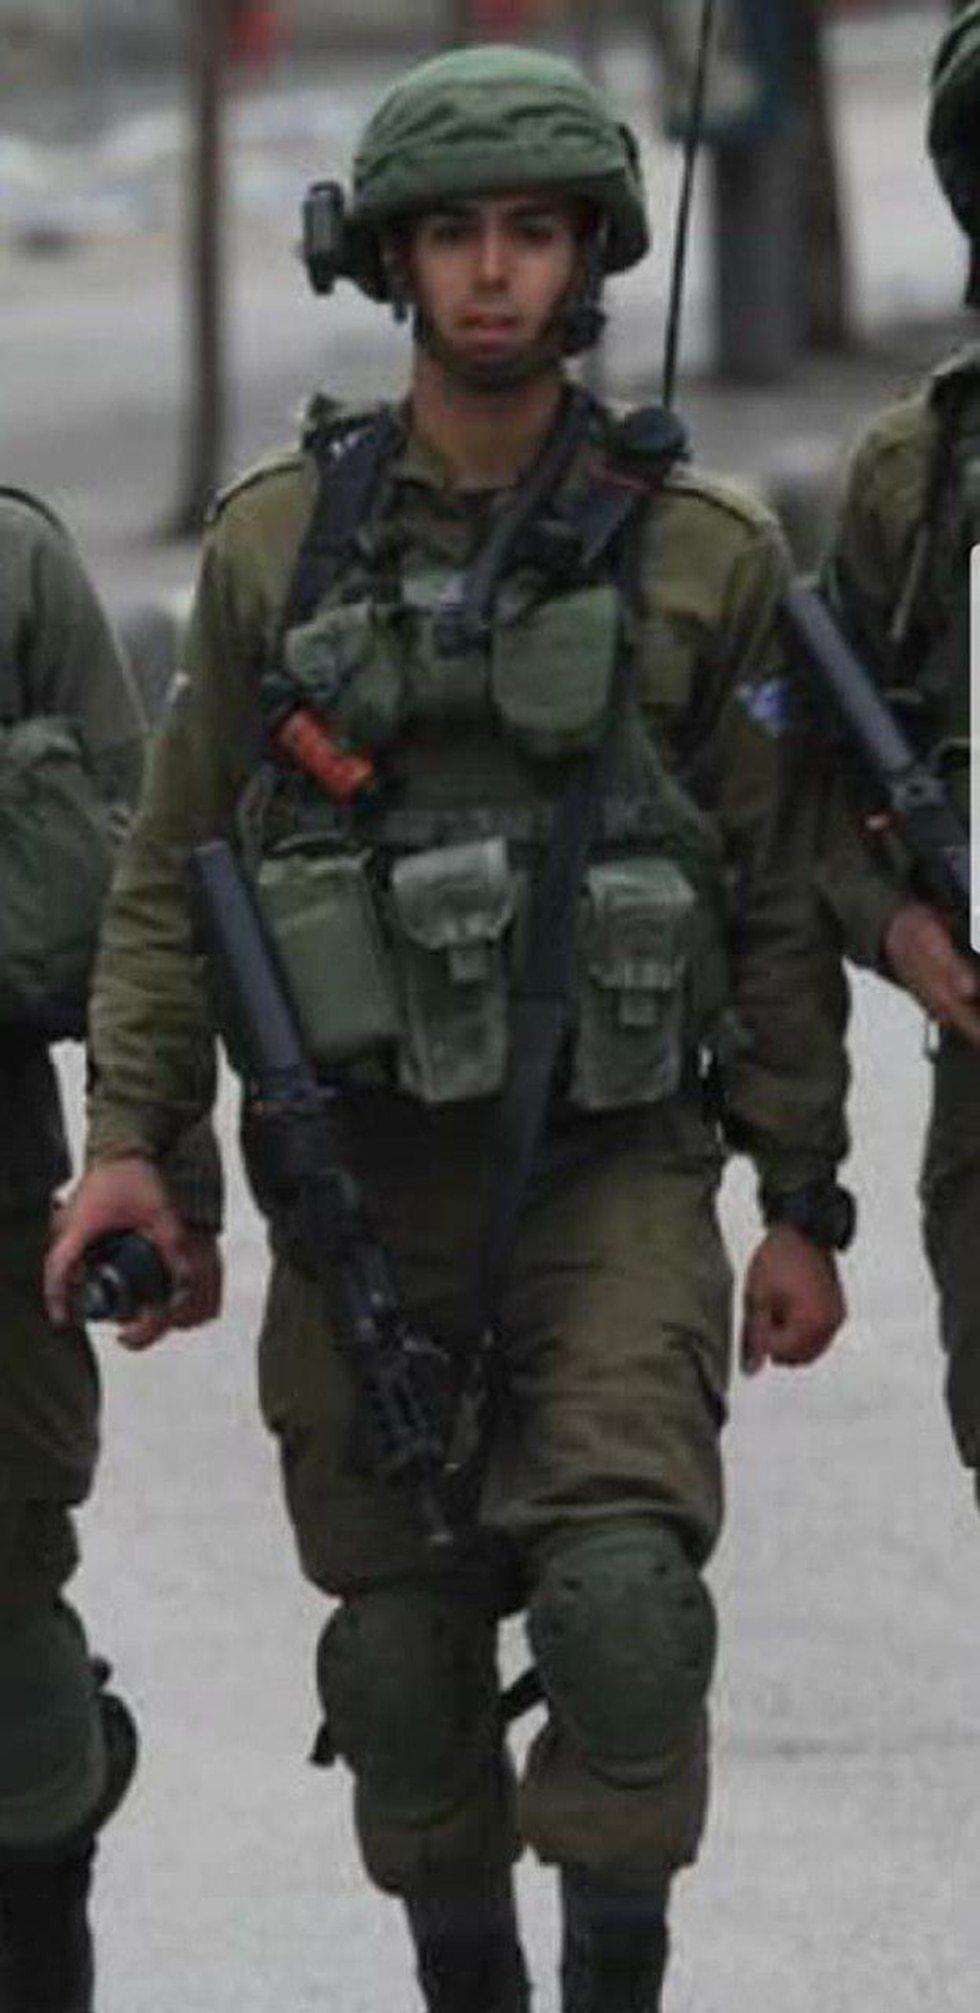 Staff Sgt. Aviv Levi